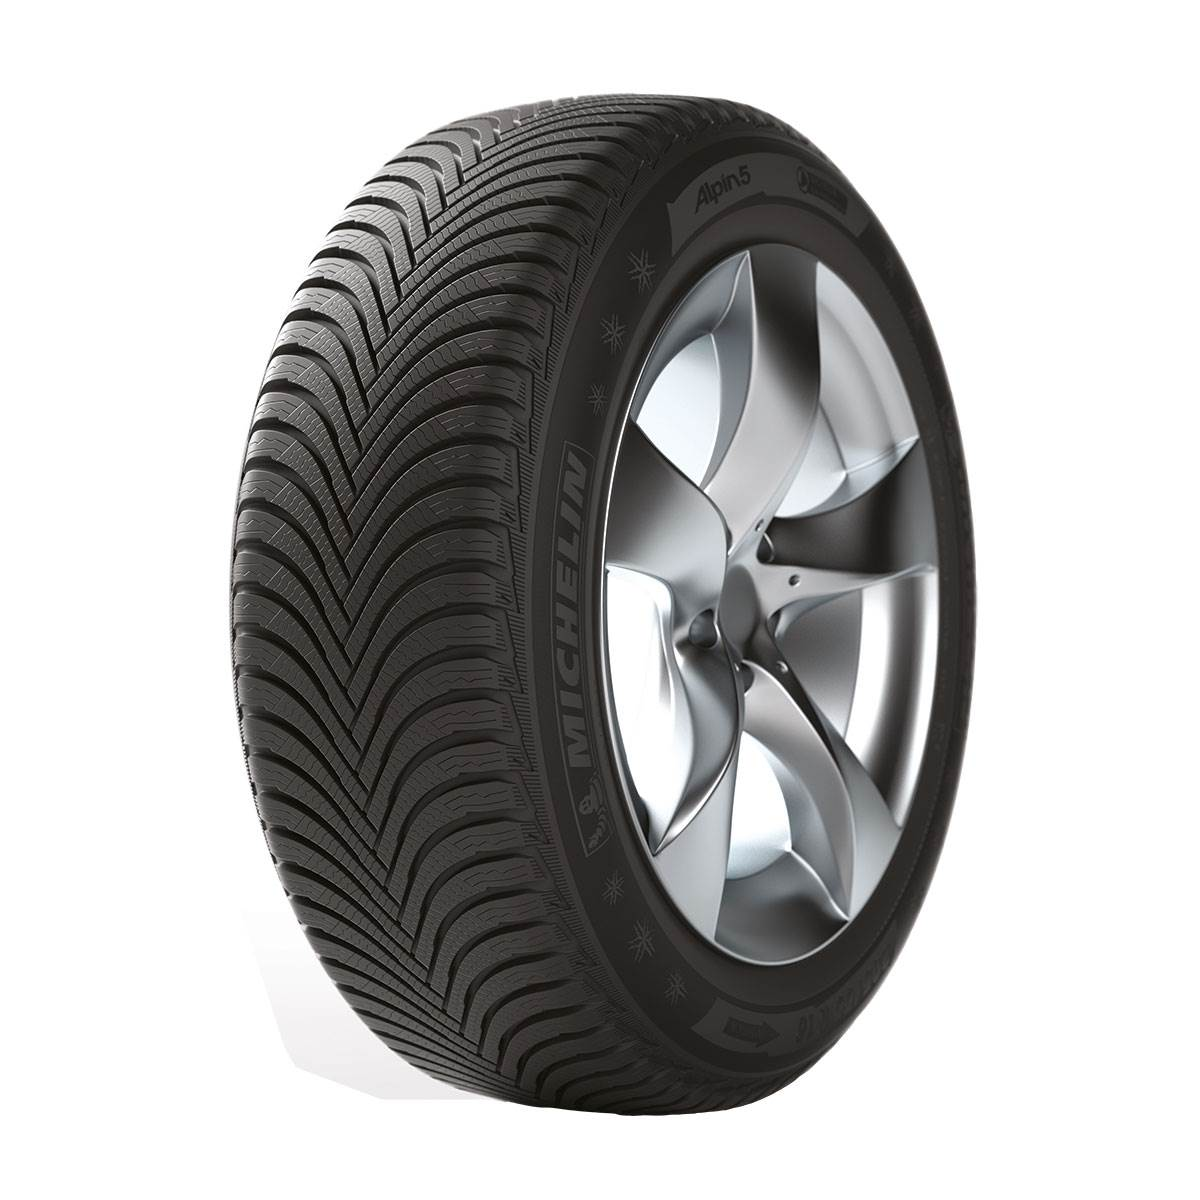 Pneu Hiver Michelin 215/60R16 99T Alpin A5 XL